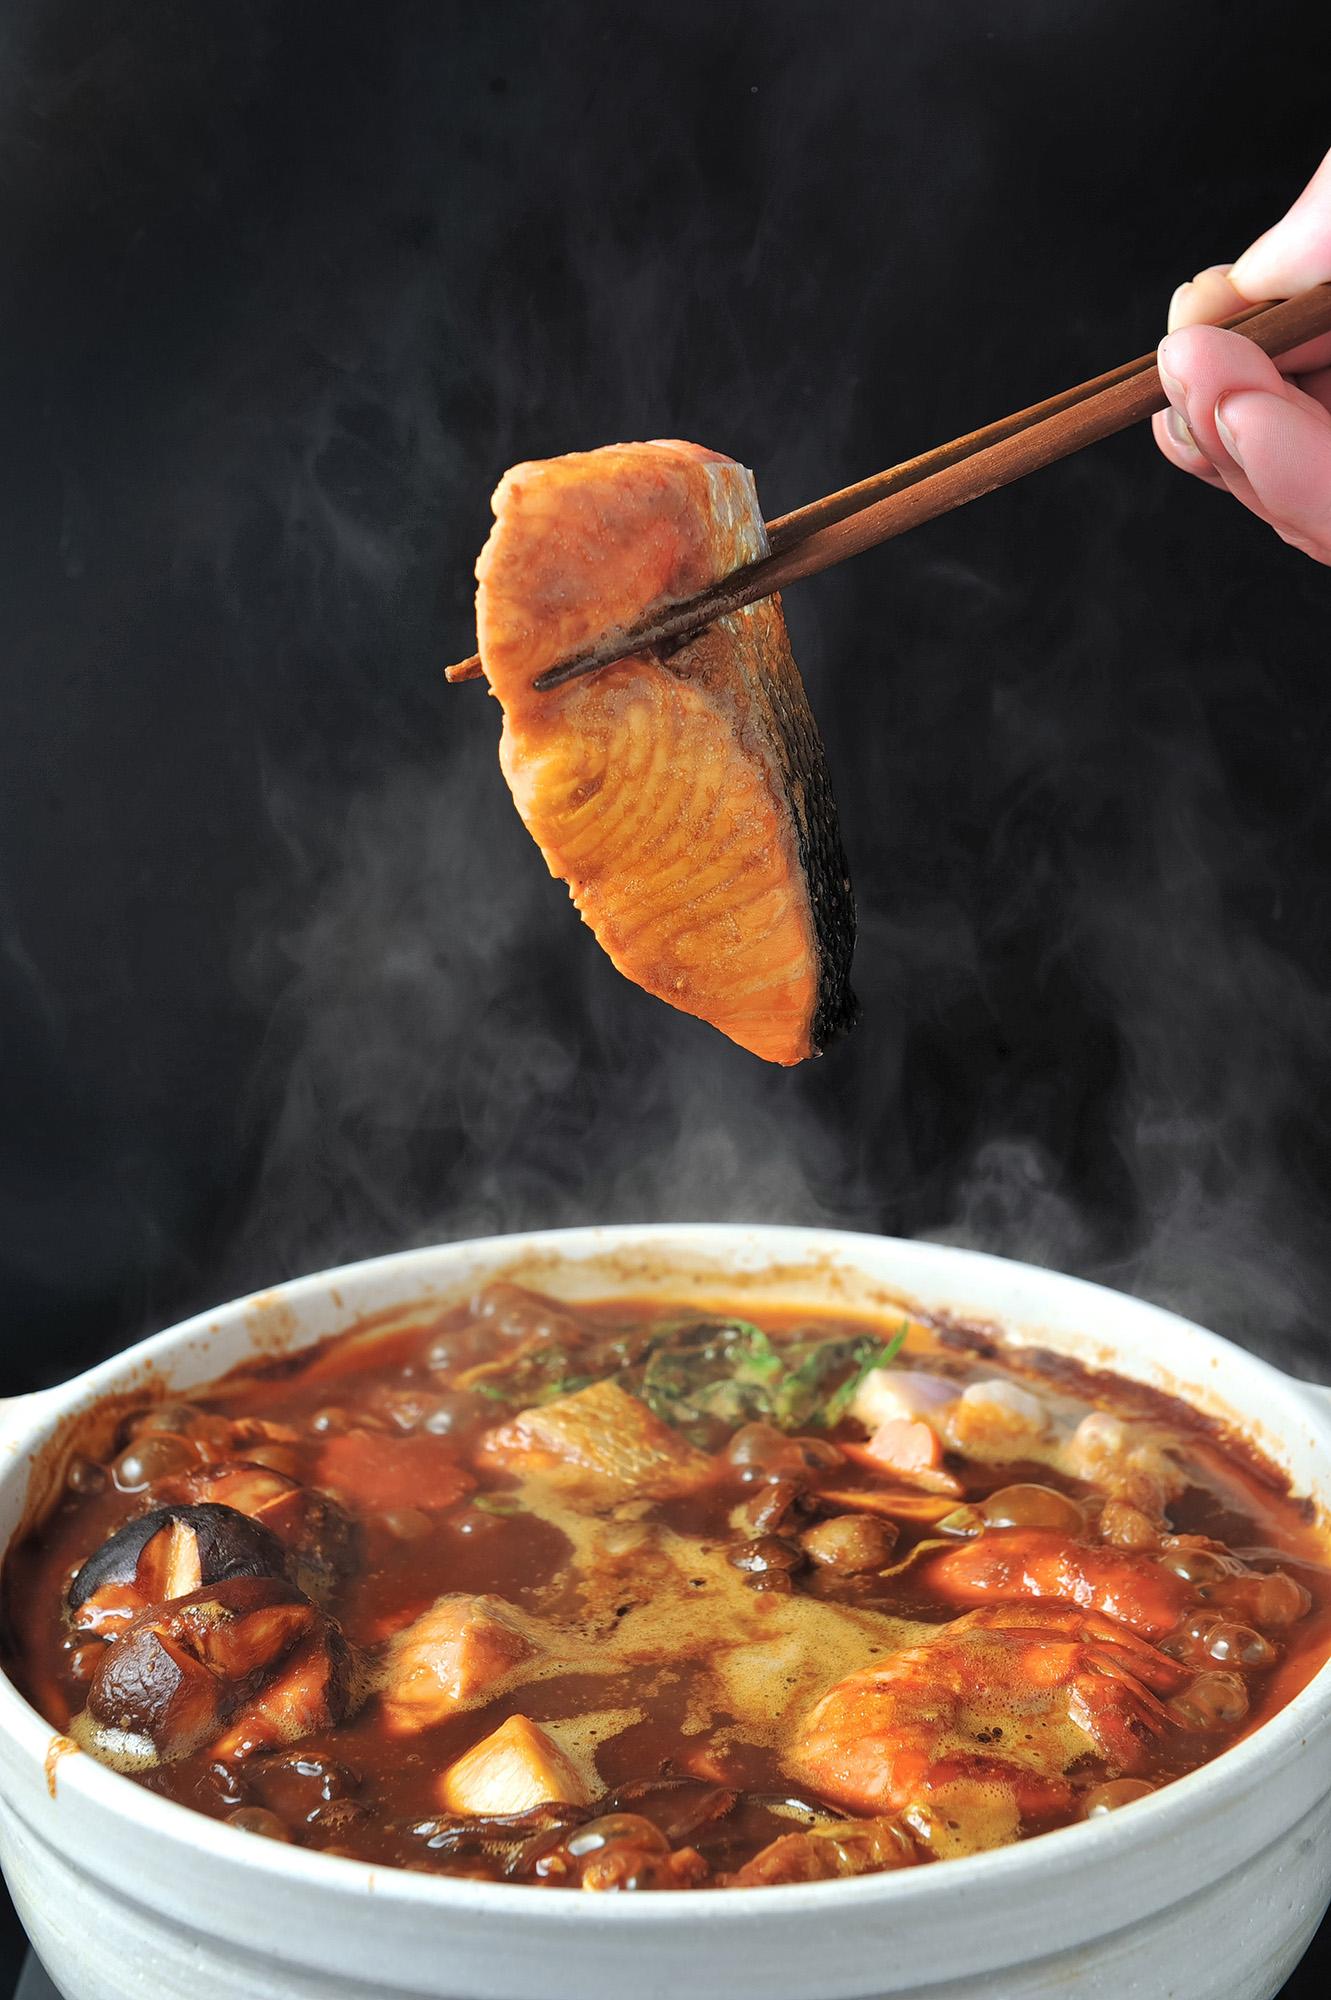 尾張味噌鍋【3人前】セット